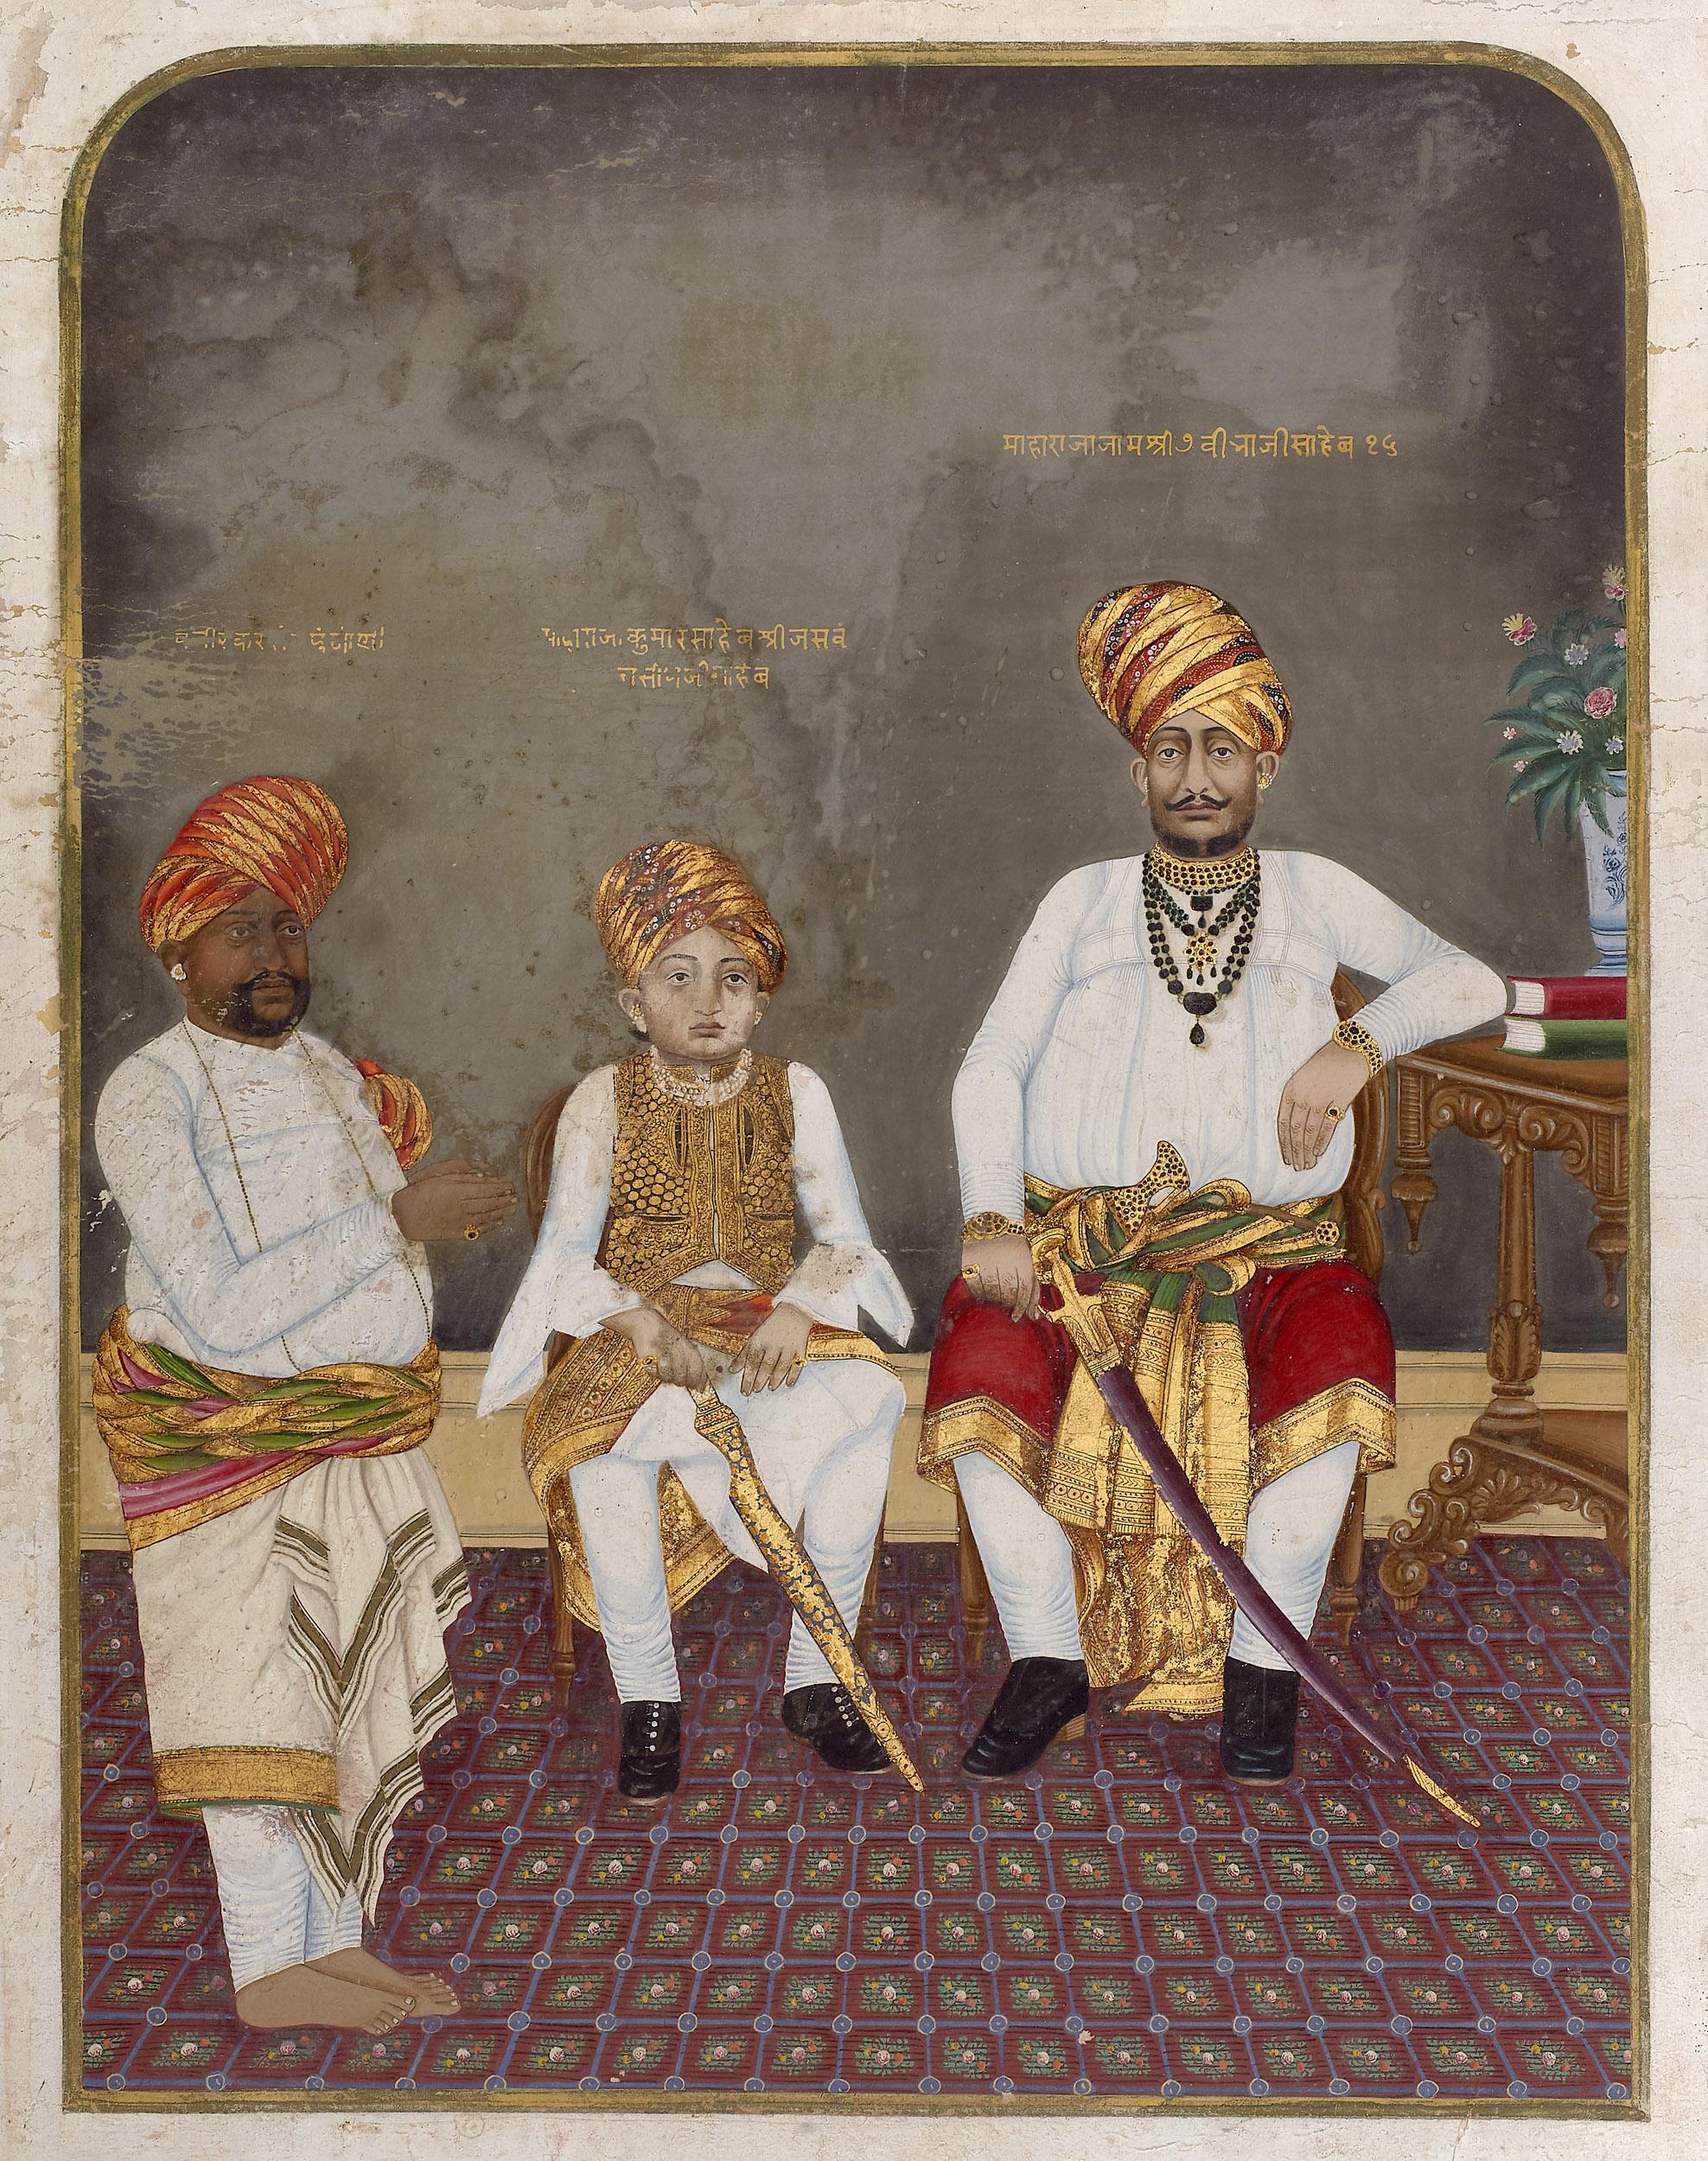 Maharaja Jam Vibhaji with His Son Kumar Jaswantji Vibhaji